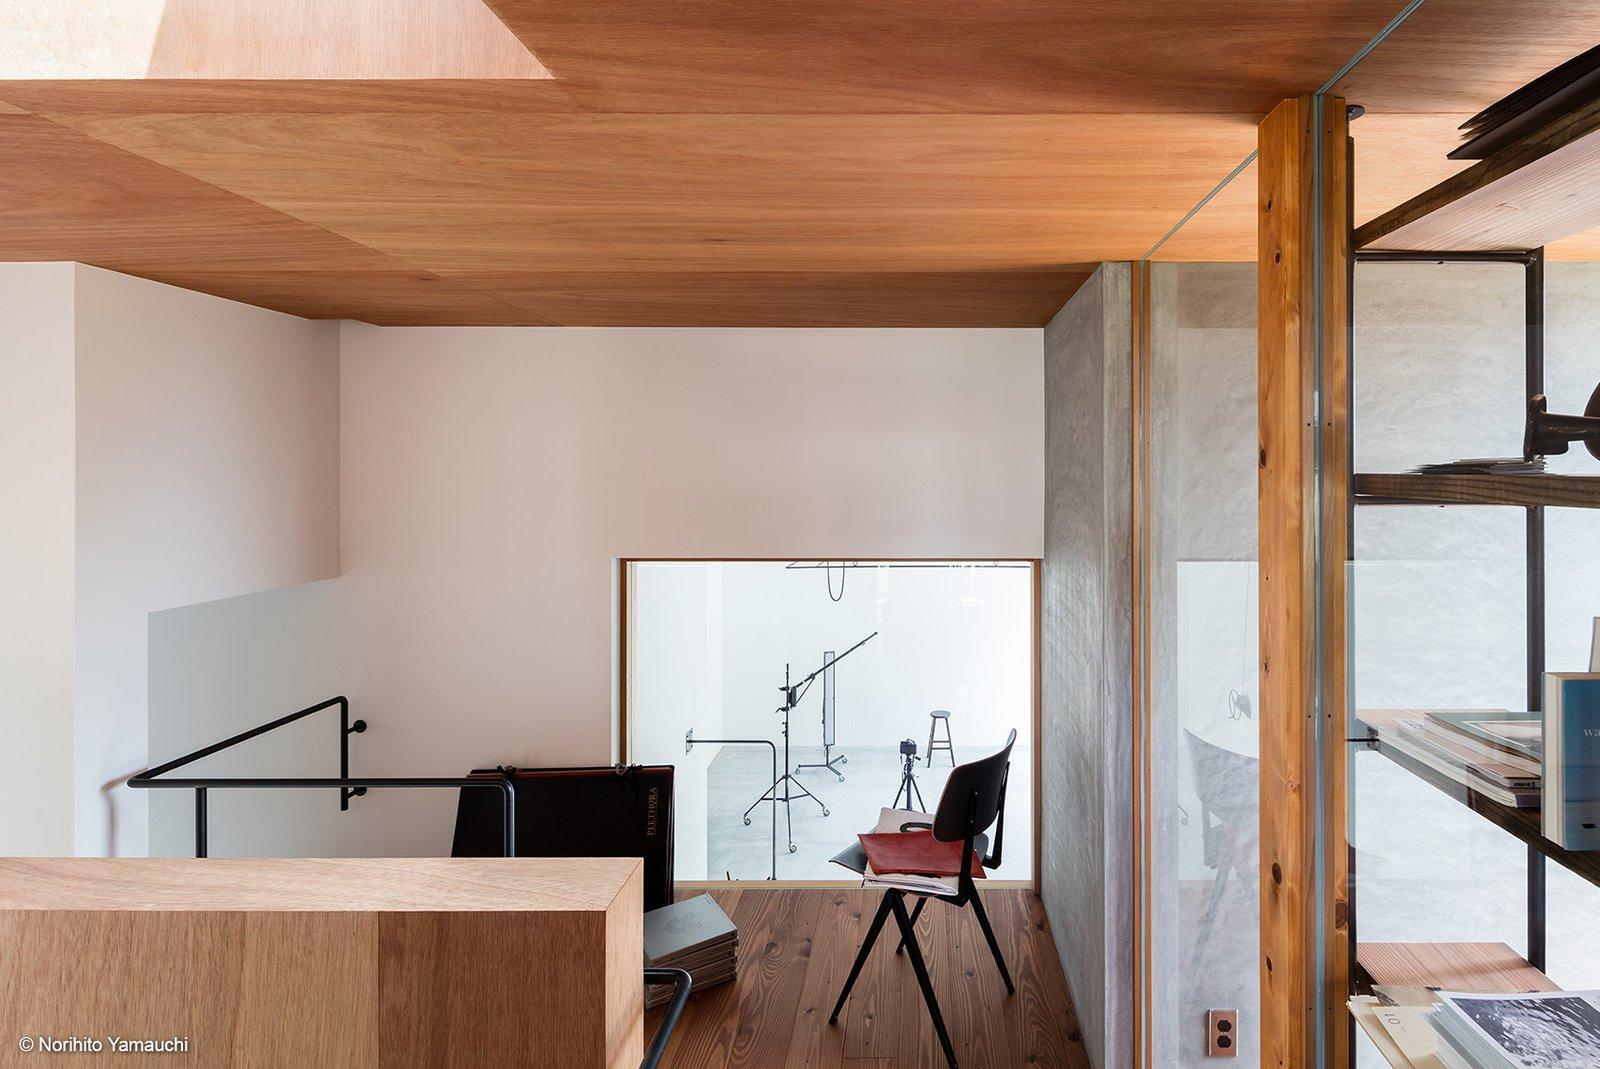 House for a Photographer by Leibal